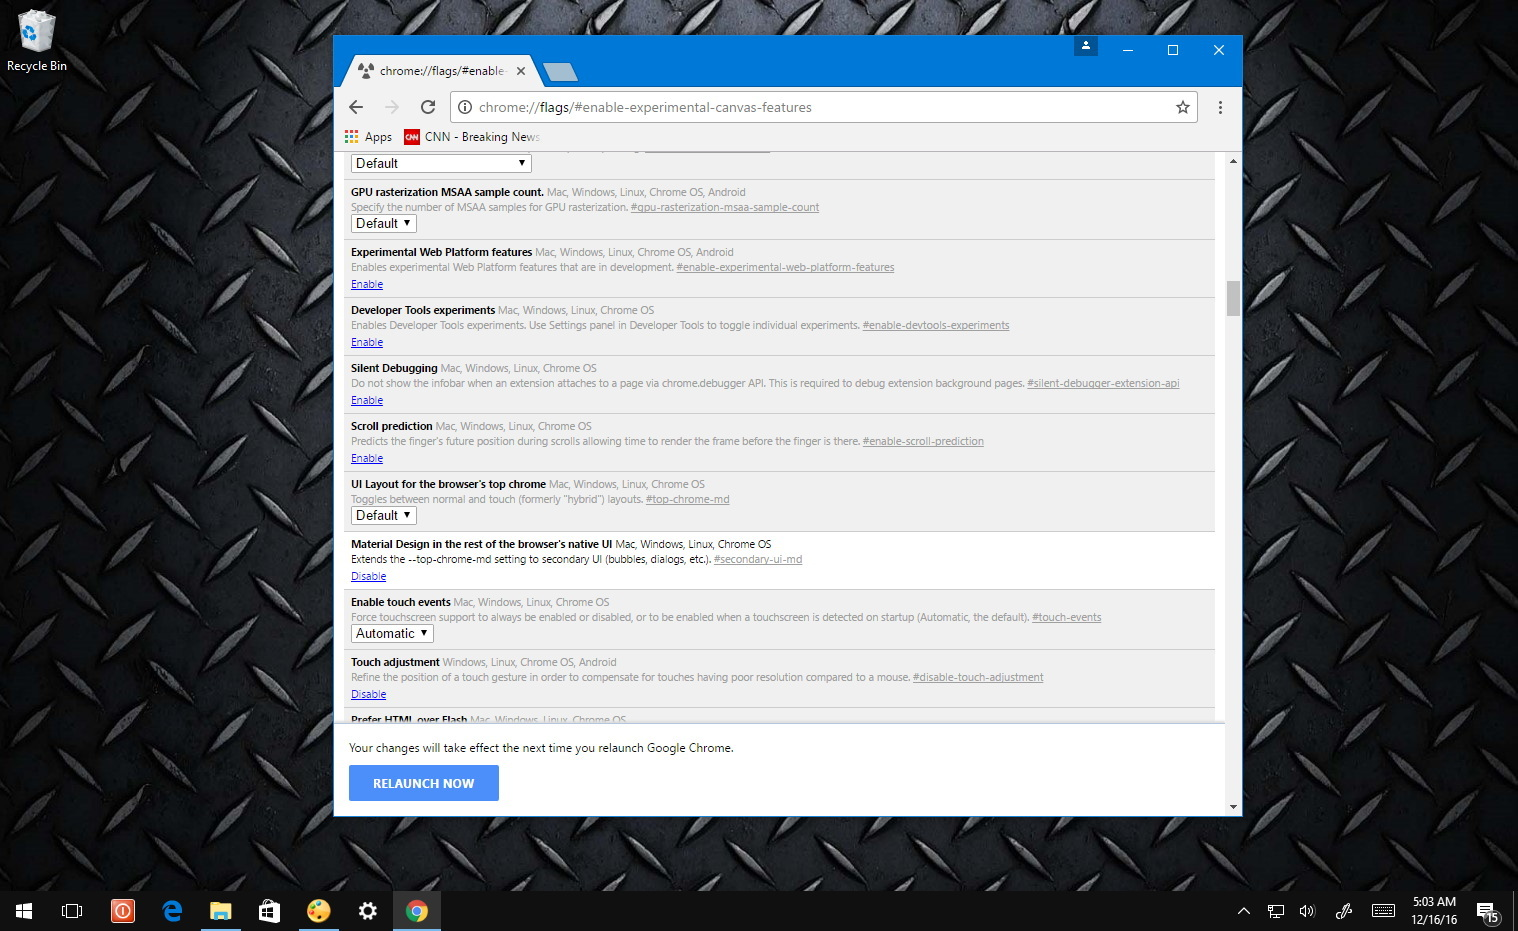 Chrome using smaller UI